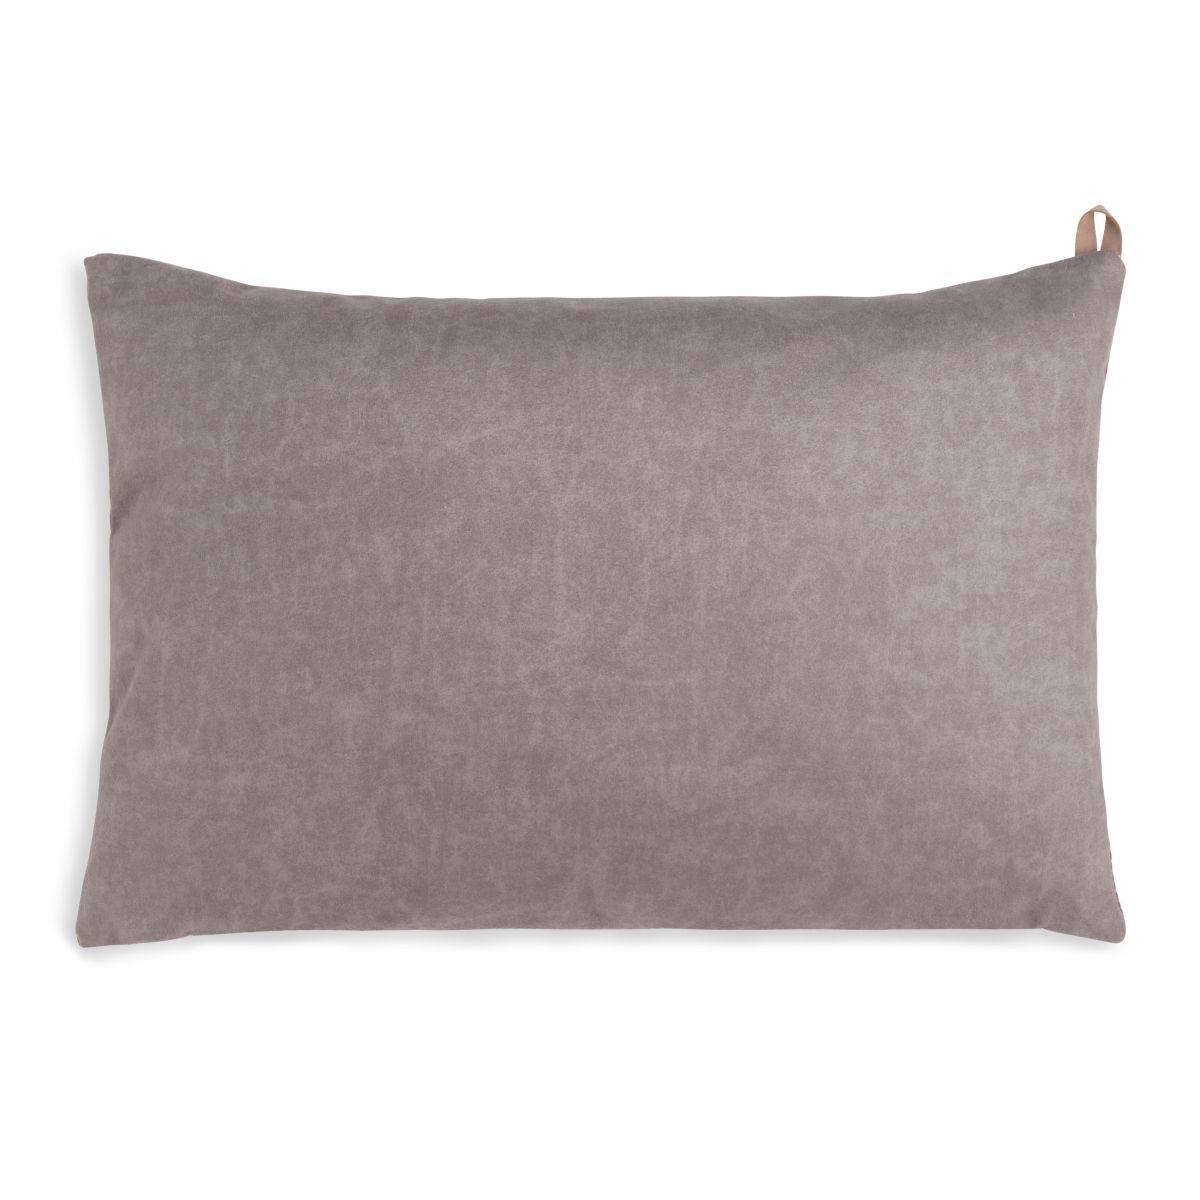 knit factory kf149013029 beau kussen taupe 60x40 2